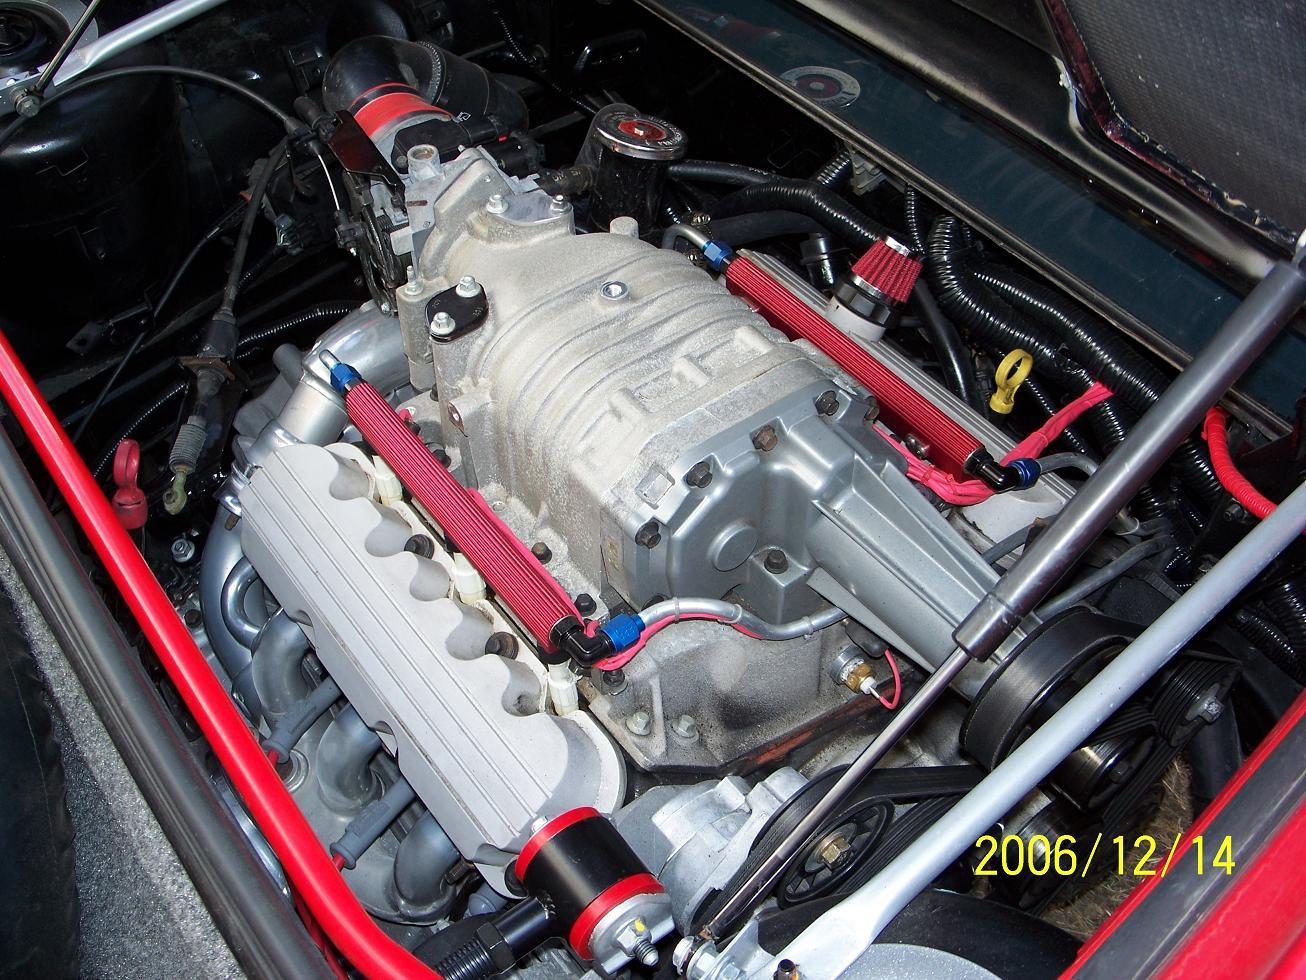 1987 Pontiac Fiero Fuse Diagram Trusted Wiring Diagrams 1986 Gt Box 3800 Engine Swap Info 04 Chevy Silverado 1988